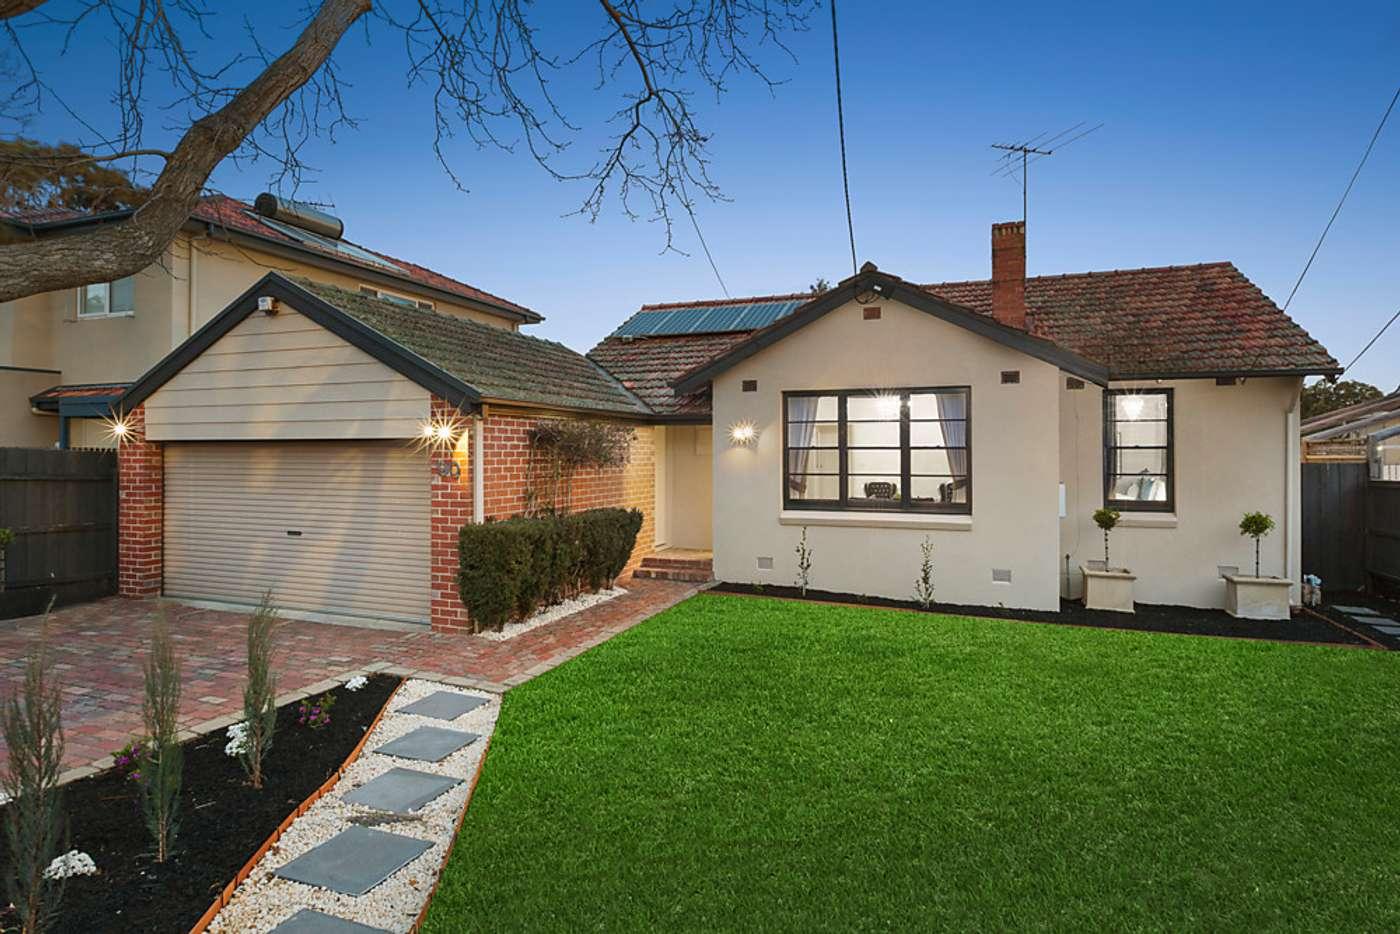 Main view of Homely house listing, 90 Highett Road, Hampton VIC 3188